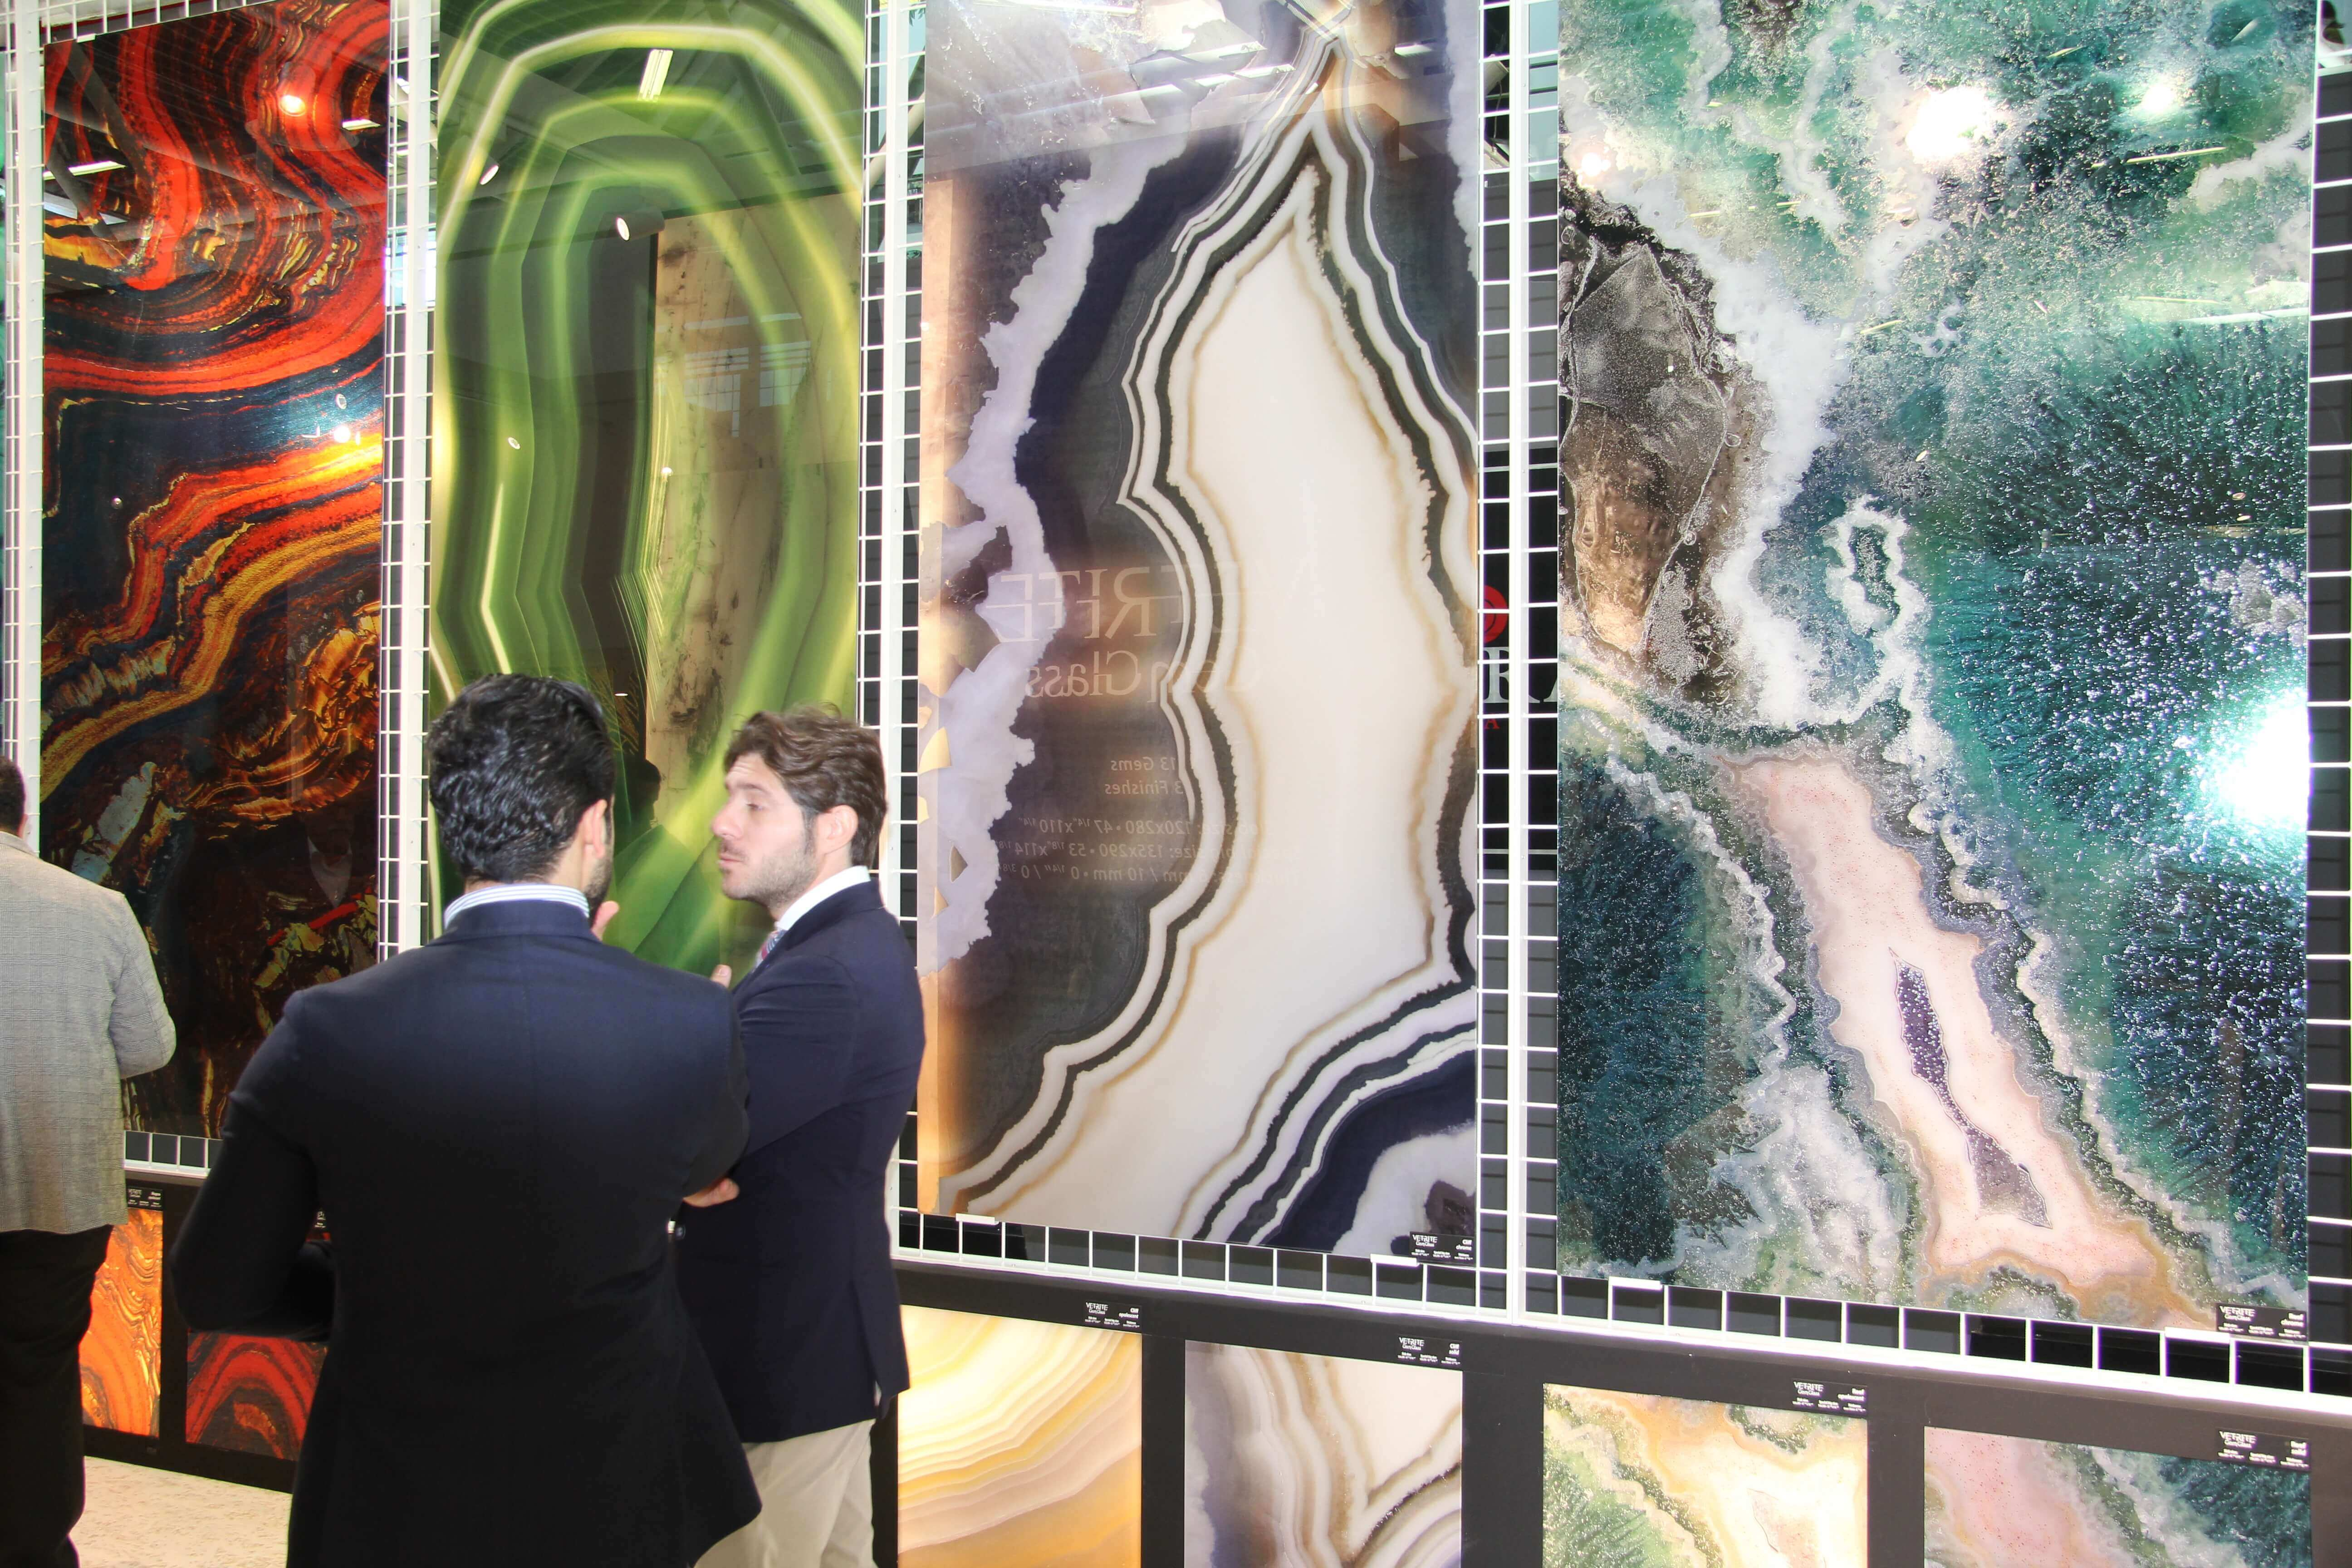 Cersaie 2018 News Trends Impressionen Trendscout Badarchitektur Baddesigner Designer Consulting Torsten Müller Bad Honnef